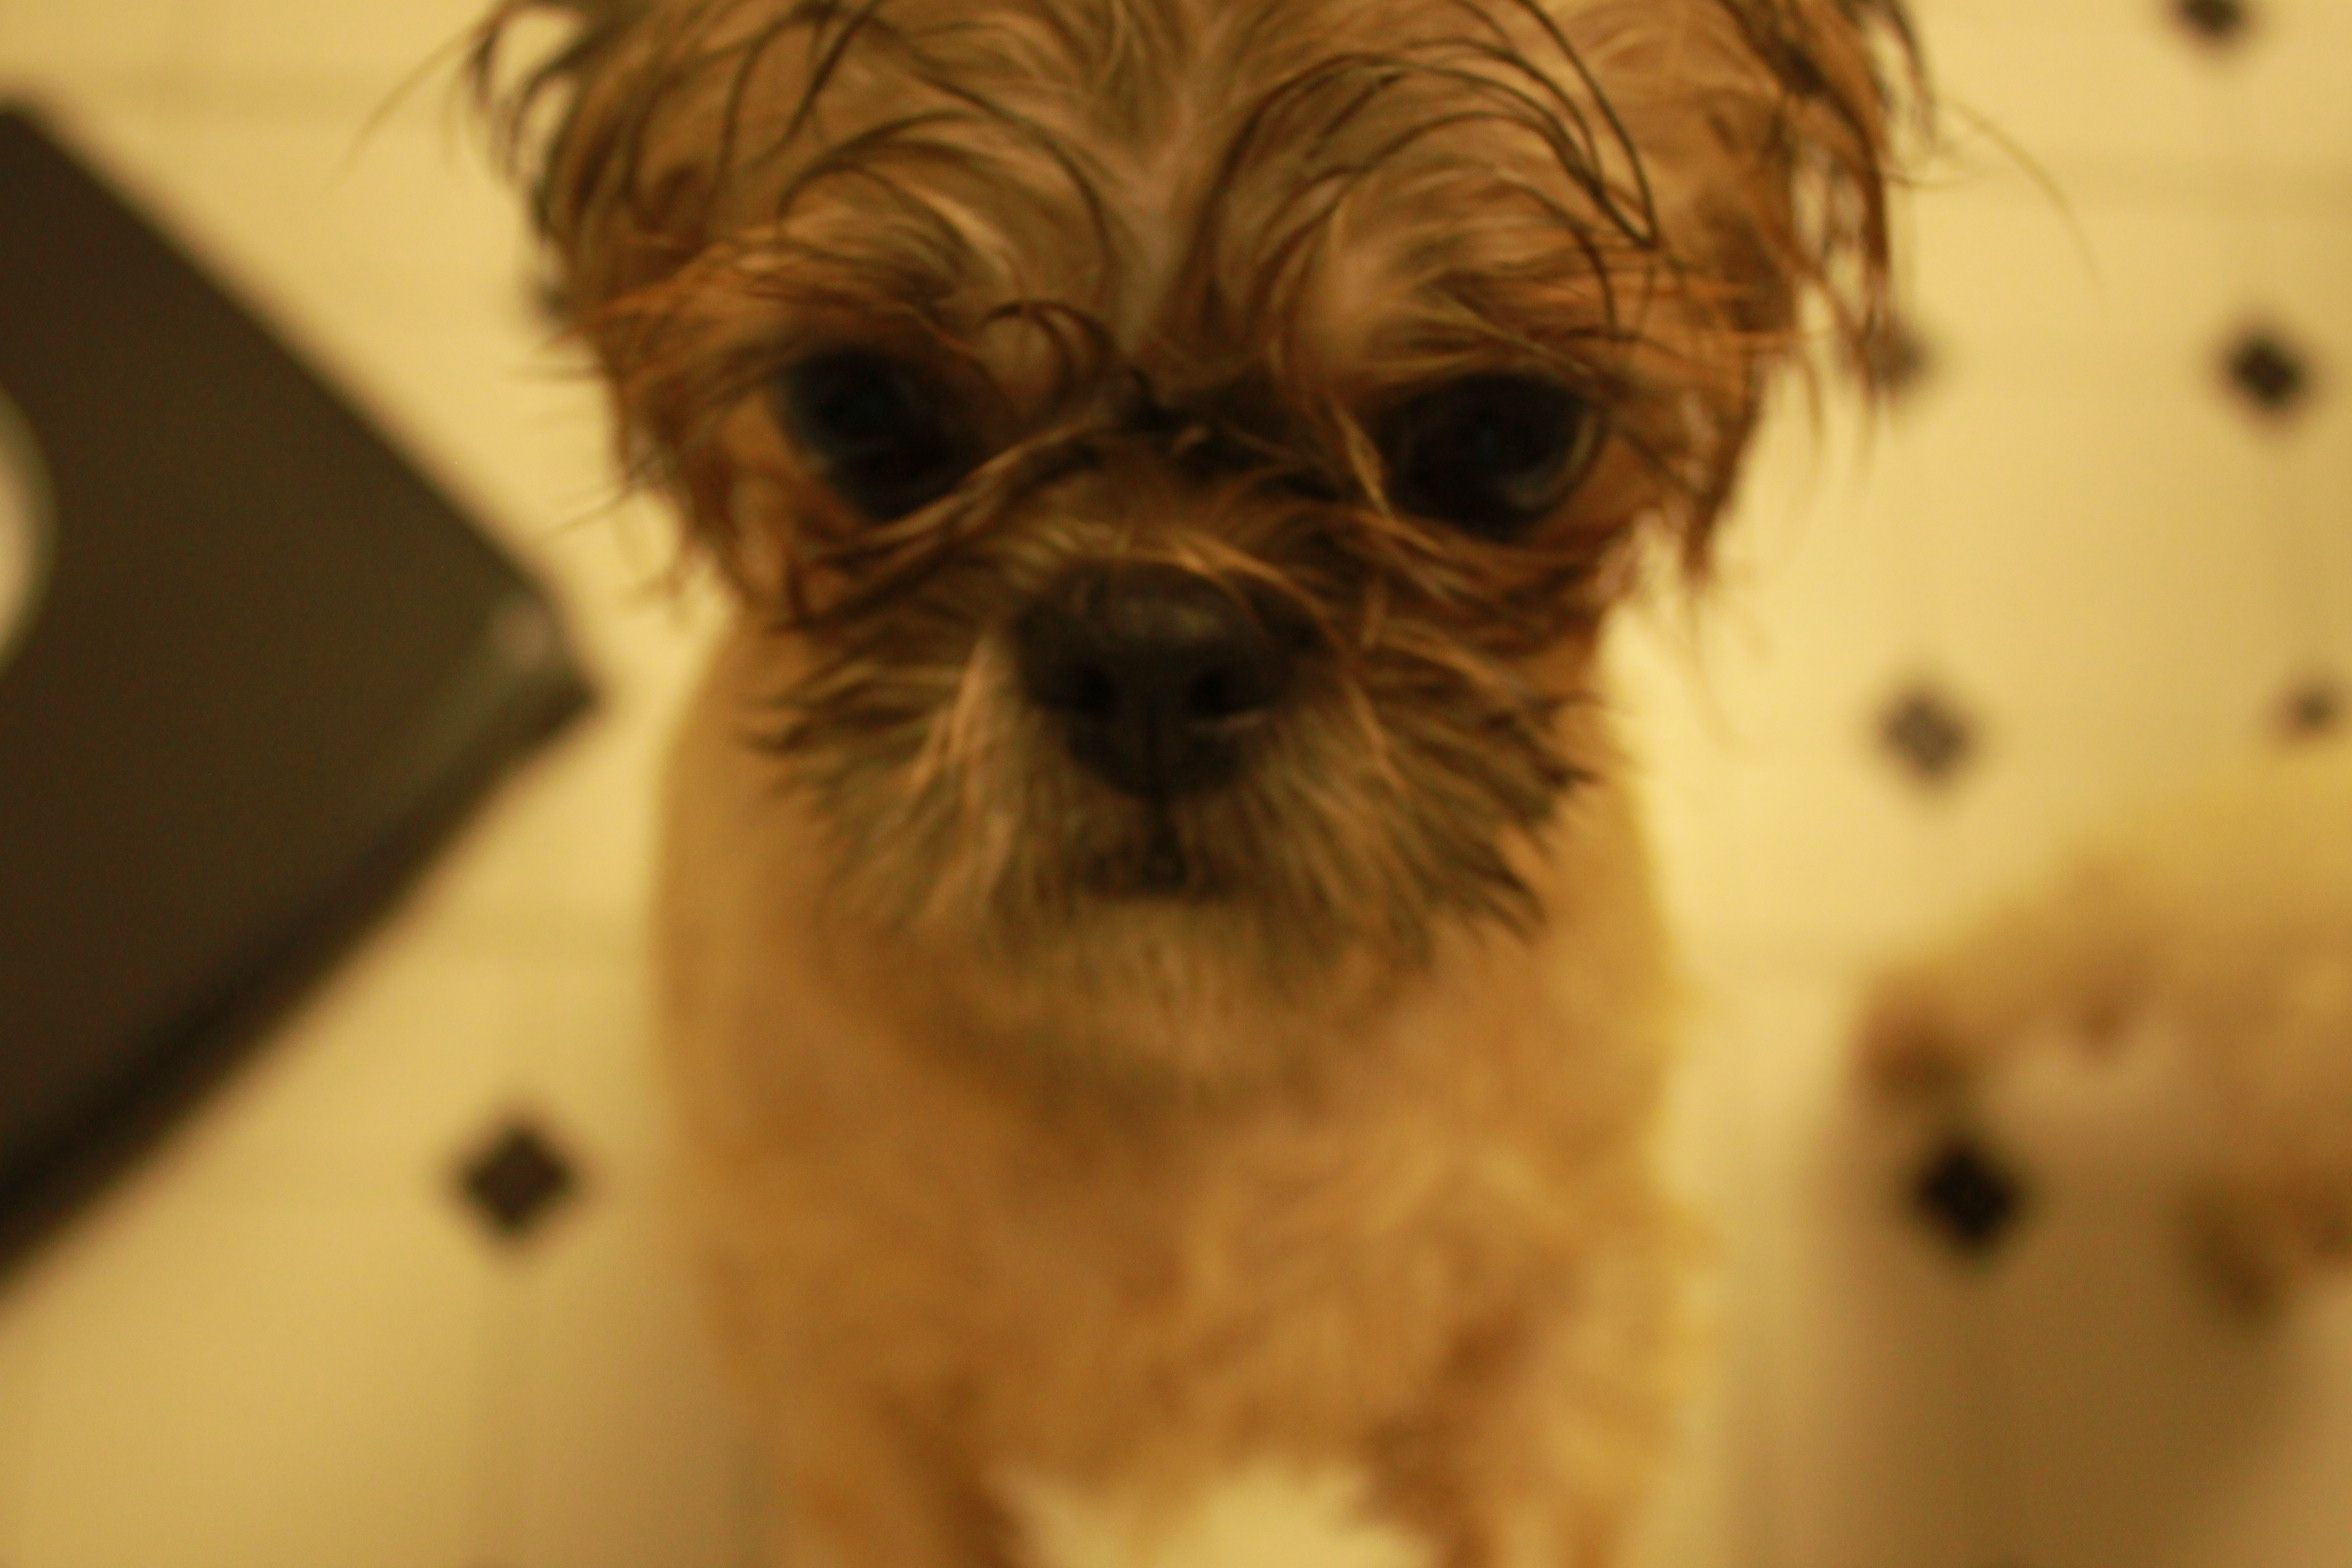 Libby the Pekingese after a bath.